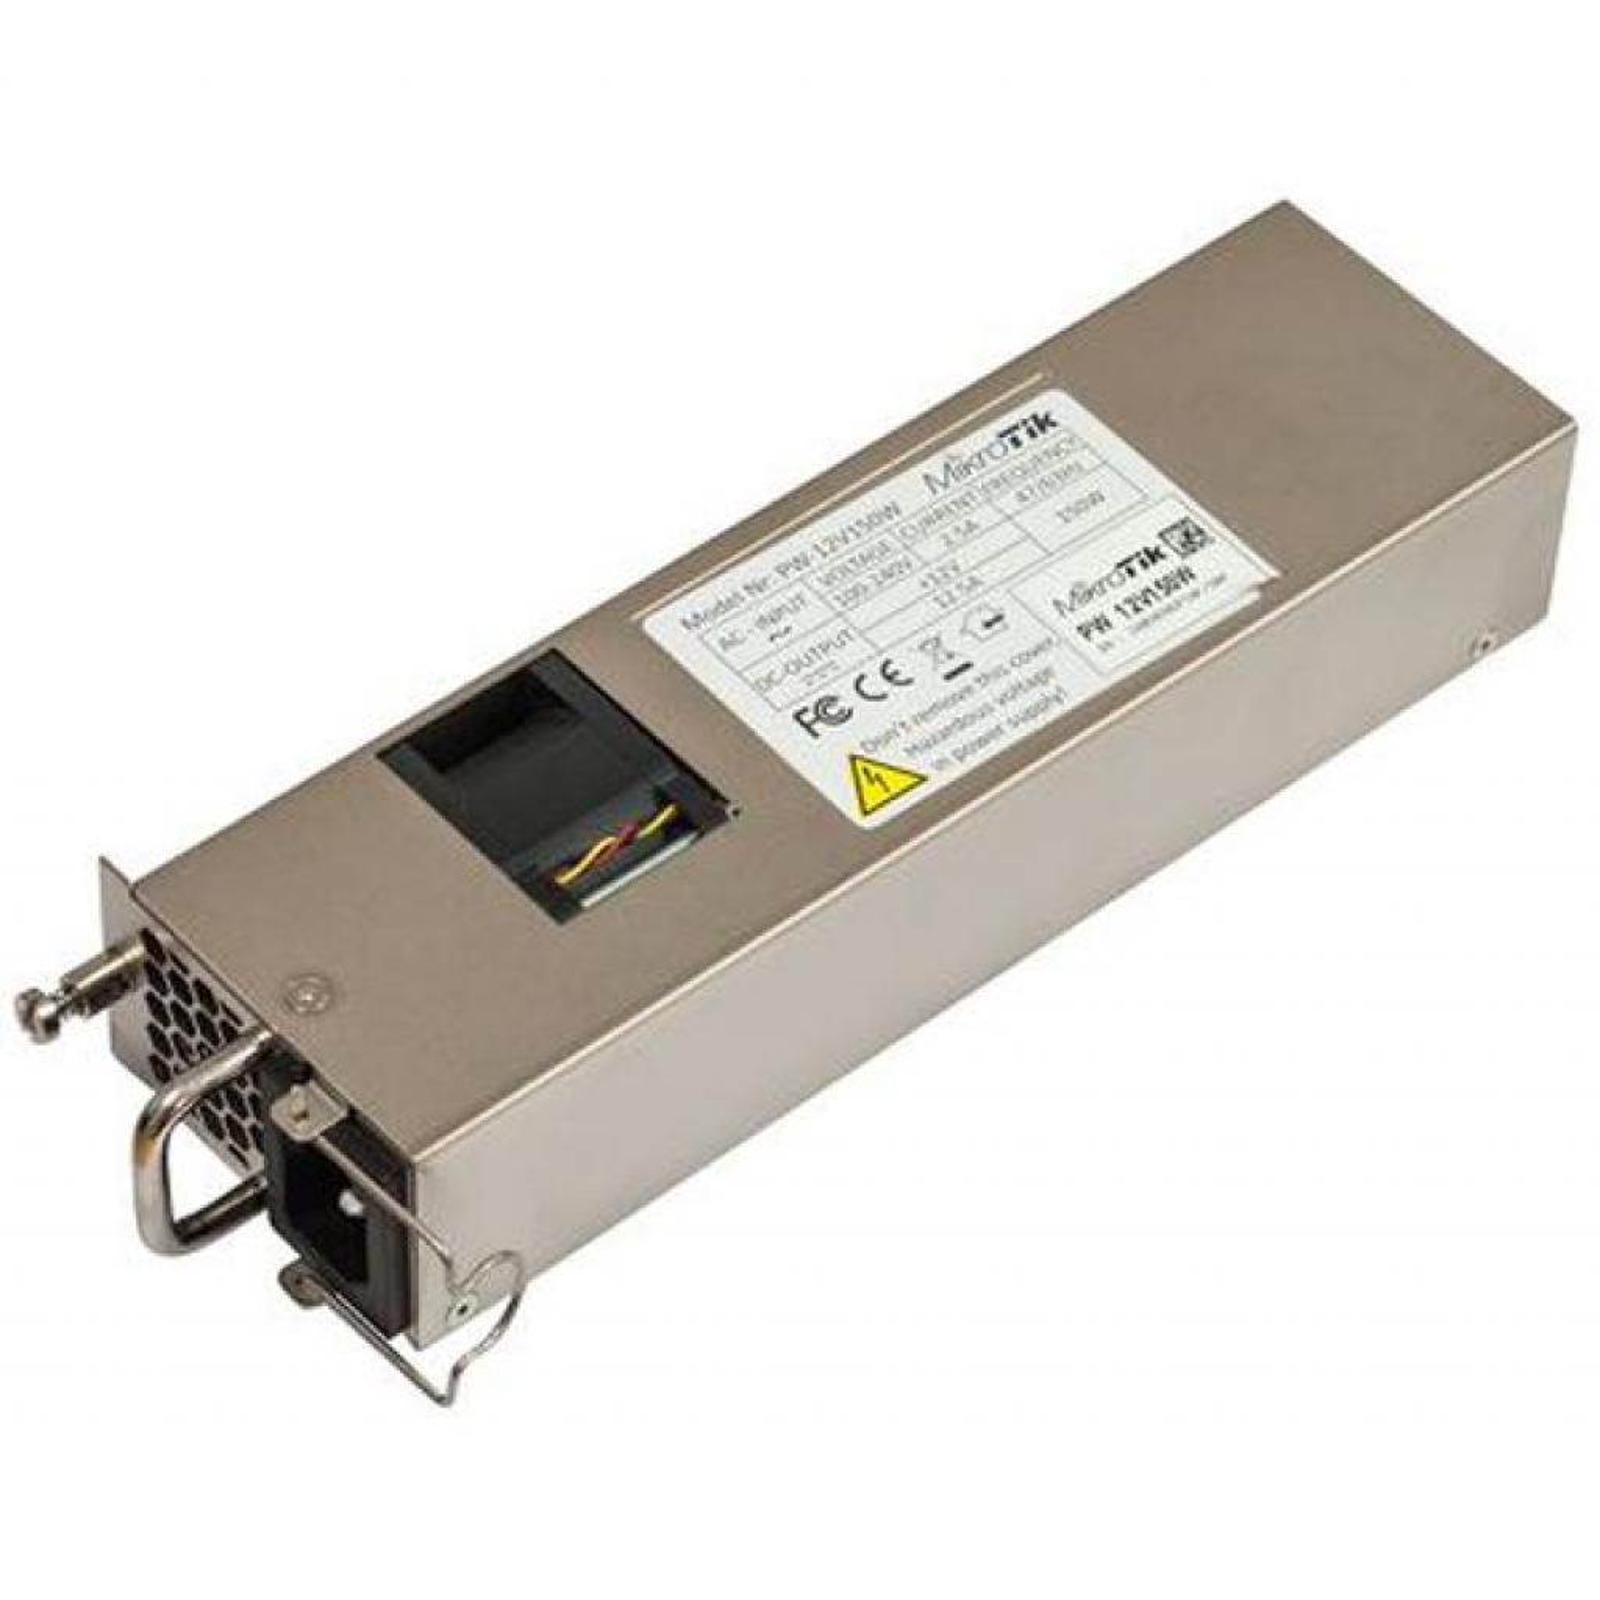 Маршрутизатор Mikrotik CCR1072-1G-8S+ изображение 3